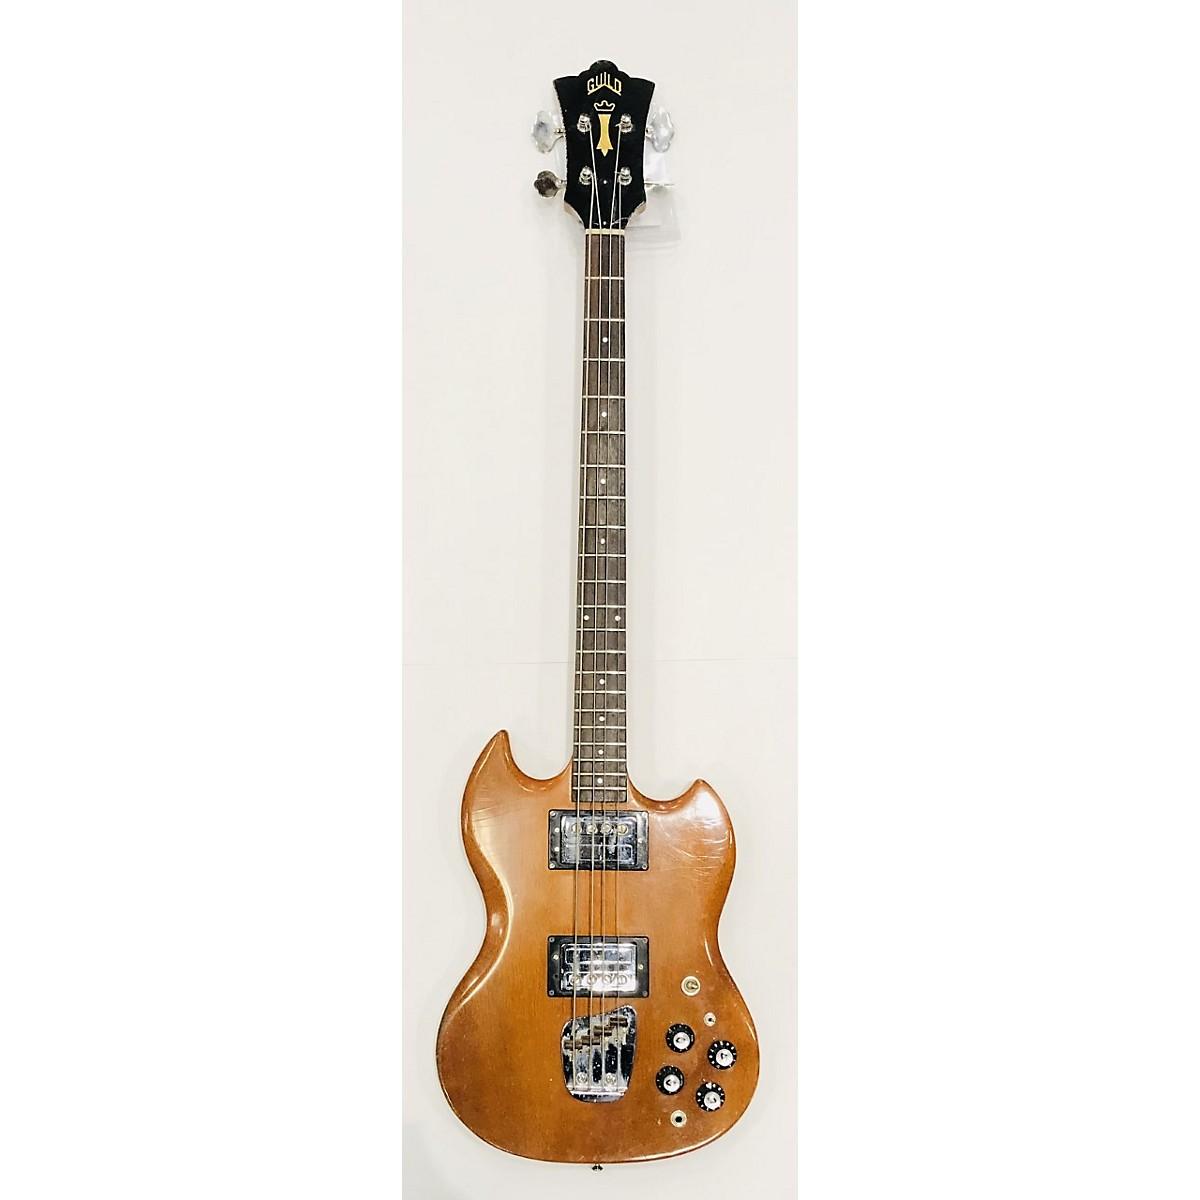 Guild 1973 JET STAR BASS II NATURAL Electric Bass Guitar